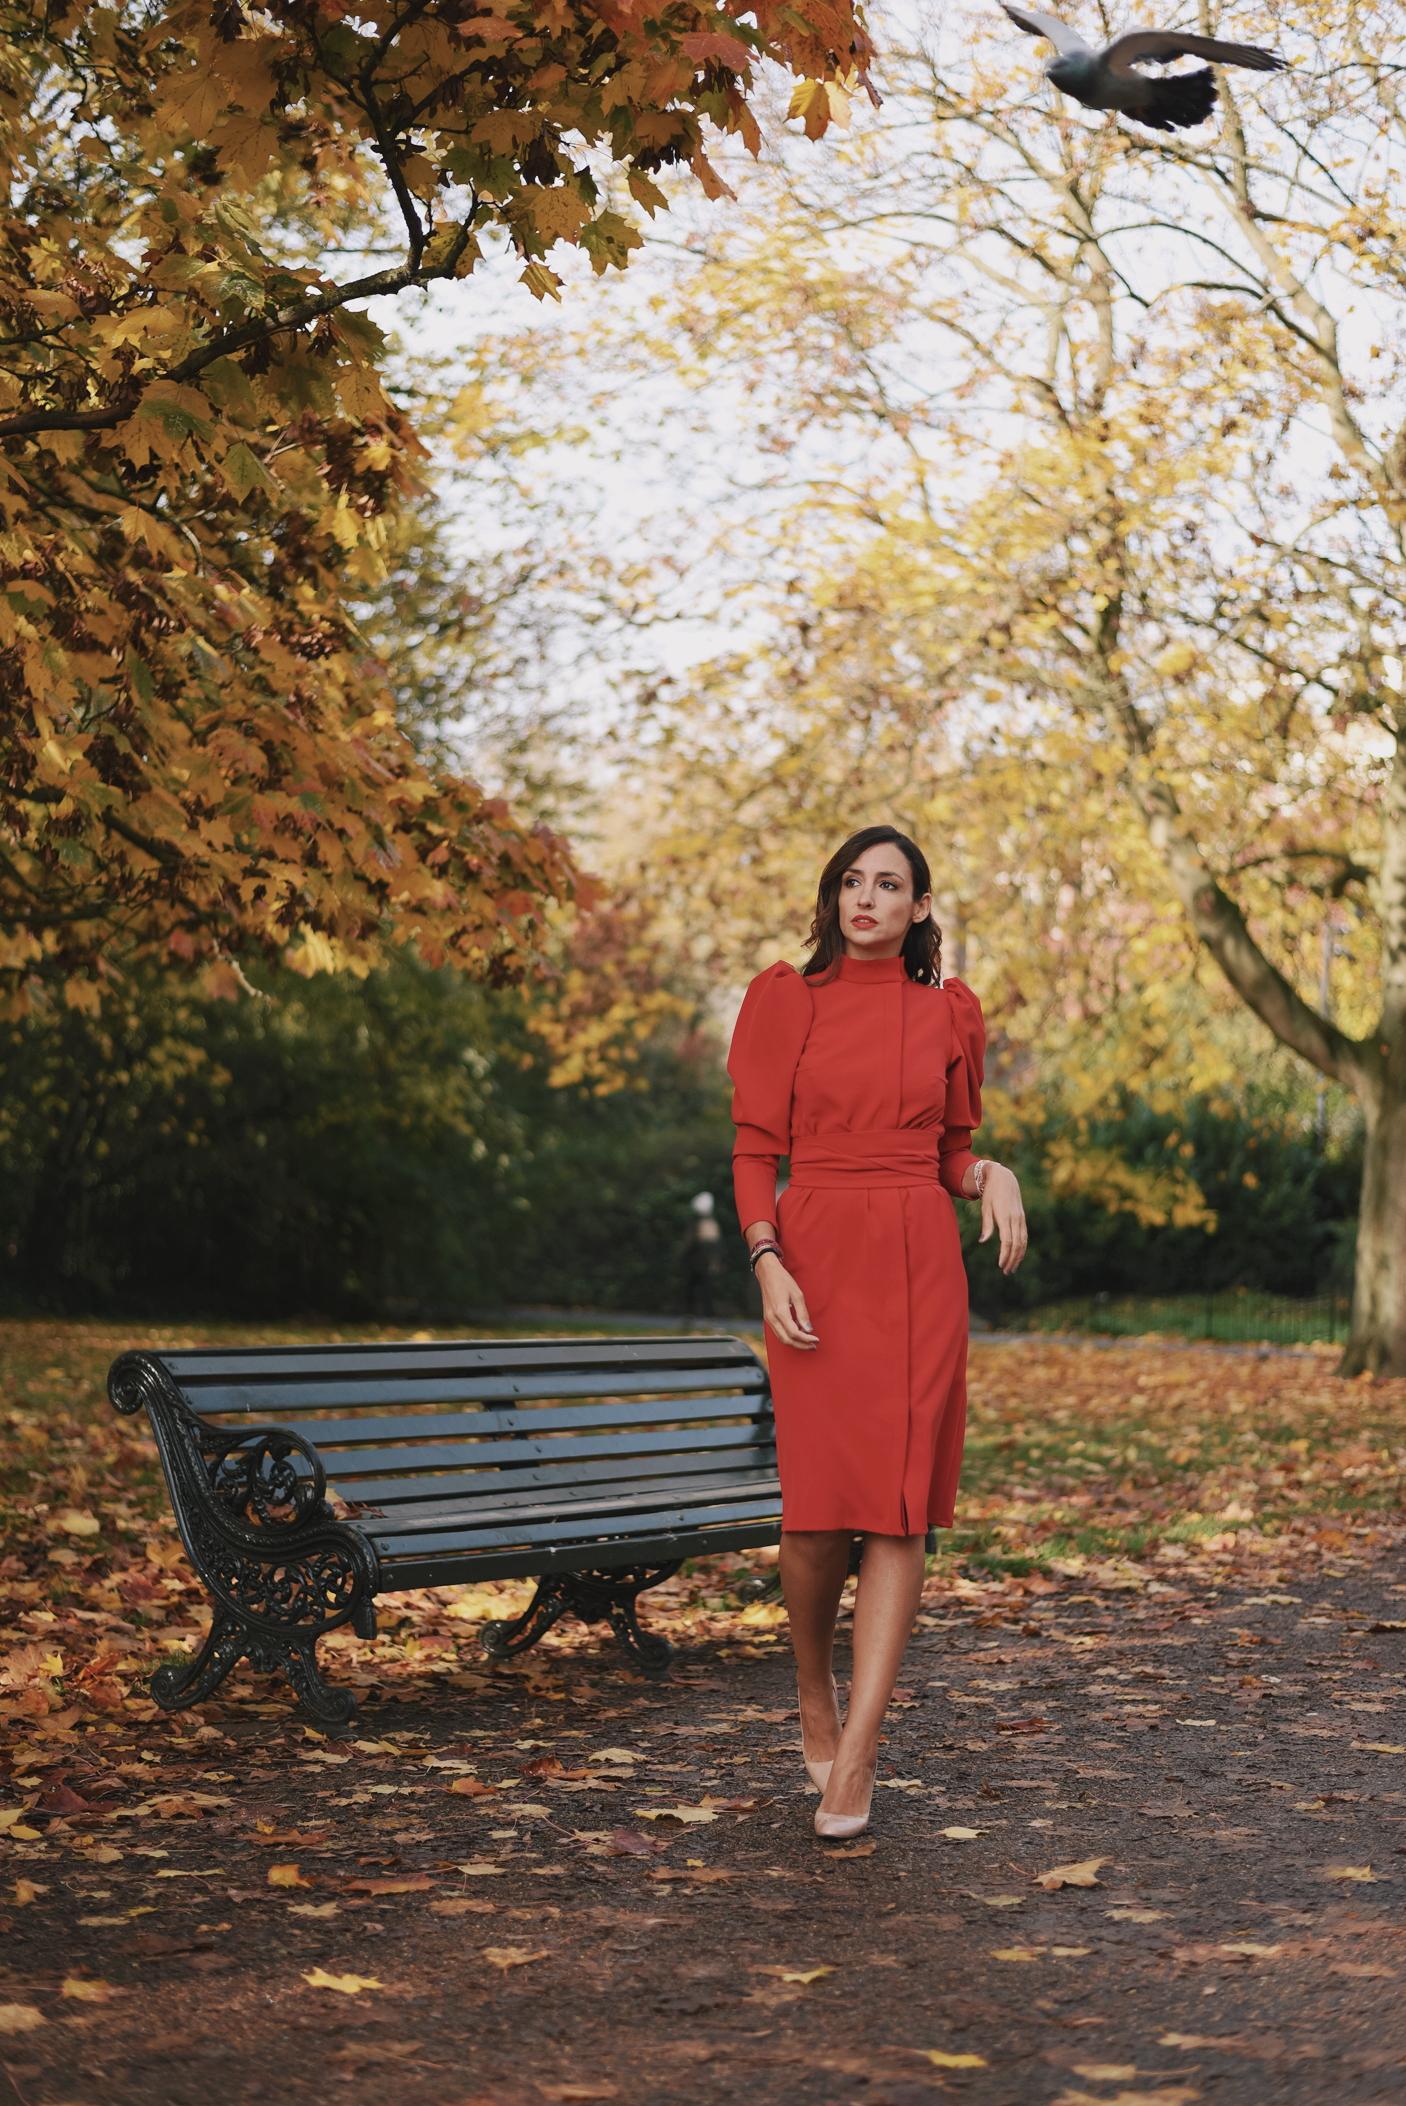 el-blog-de-silvia-invitada-perfecta-boda-vestido-rojo-pintini